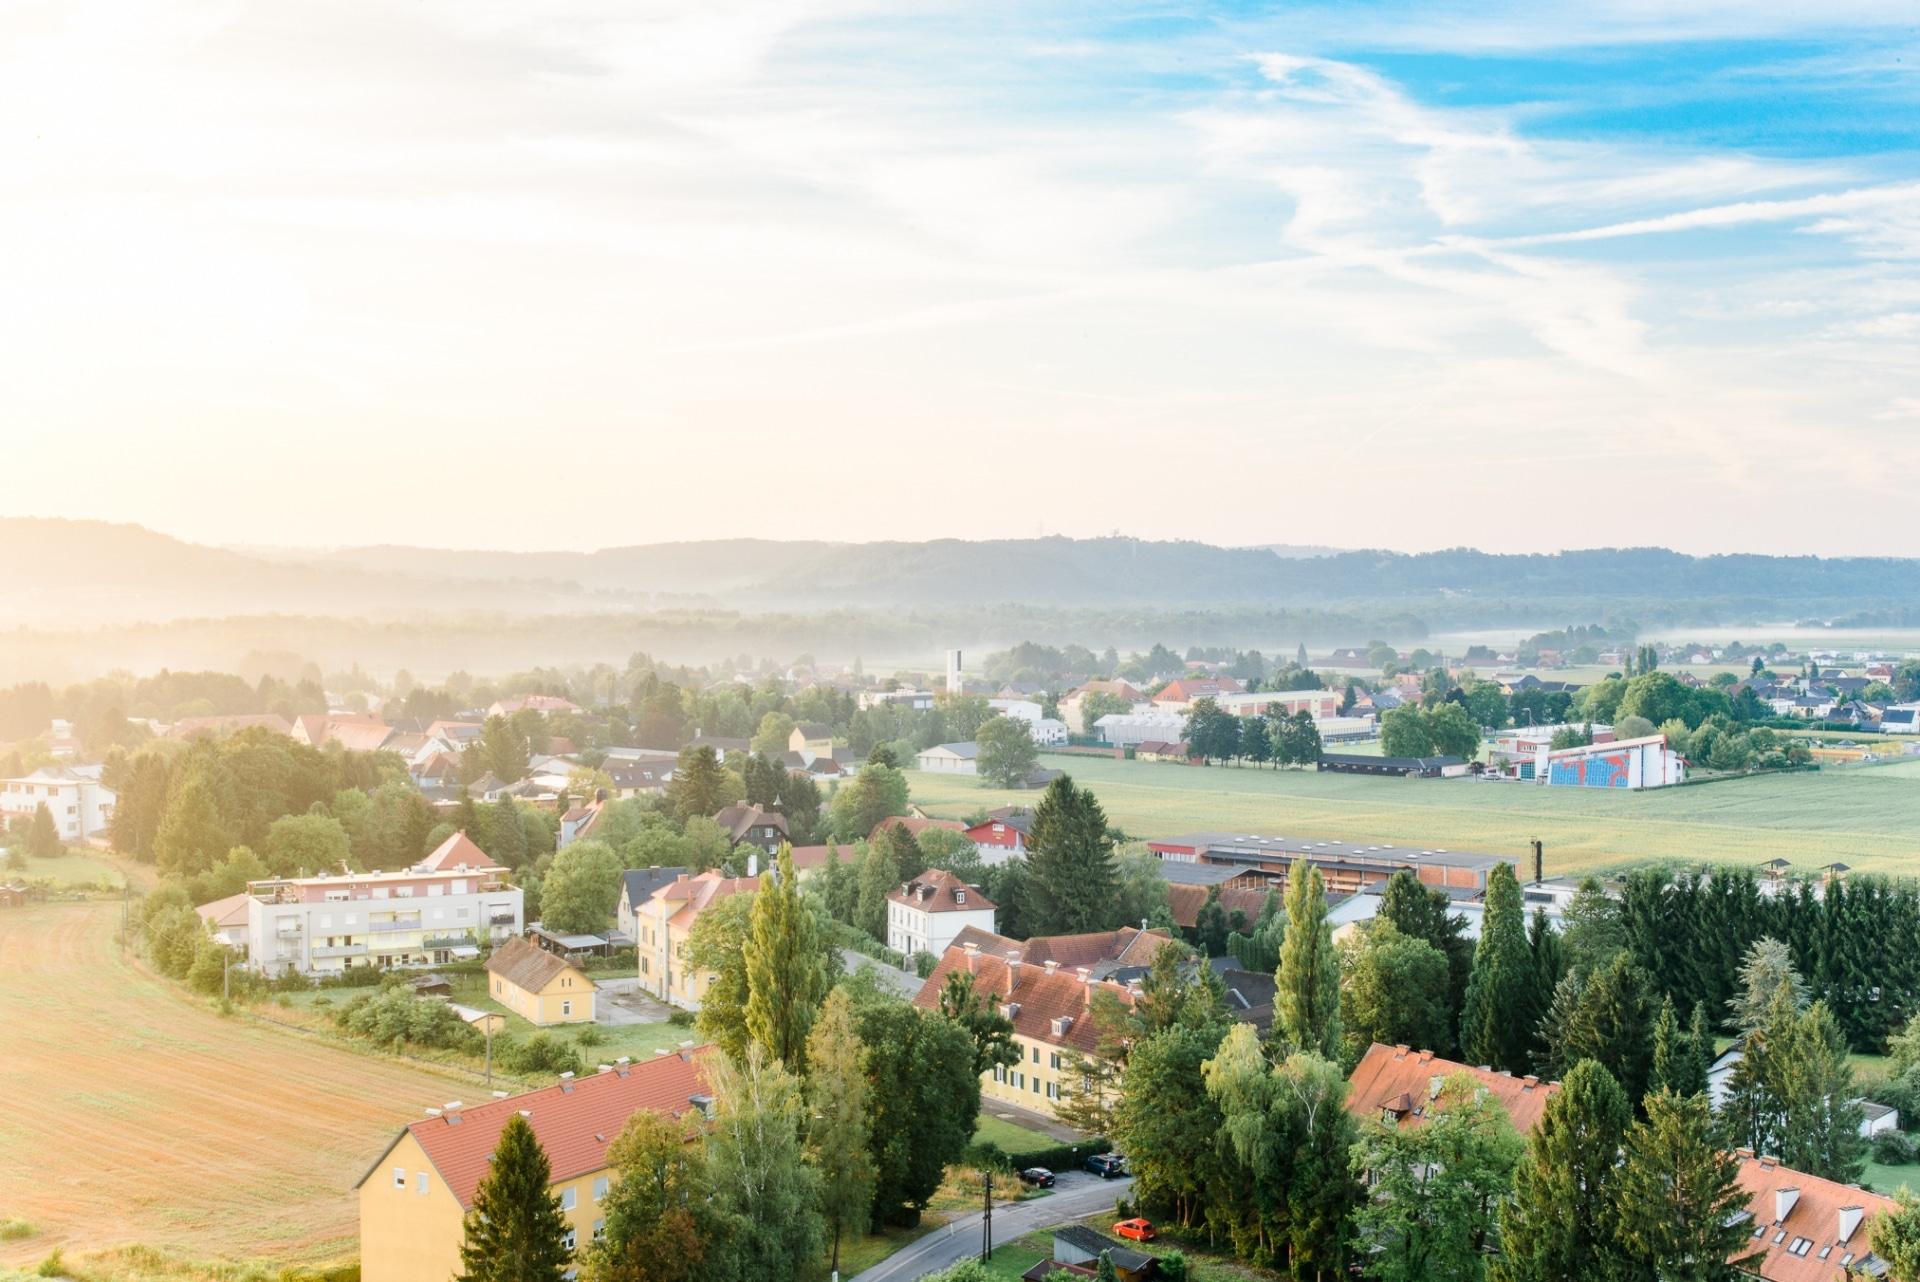 Casual dating in kalsdorf bei graz, Rheinfelden sex anzeigen